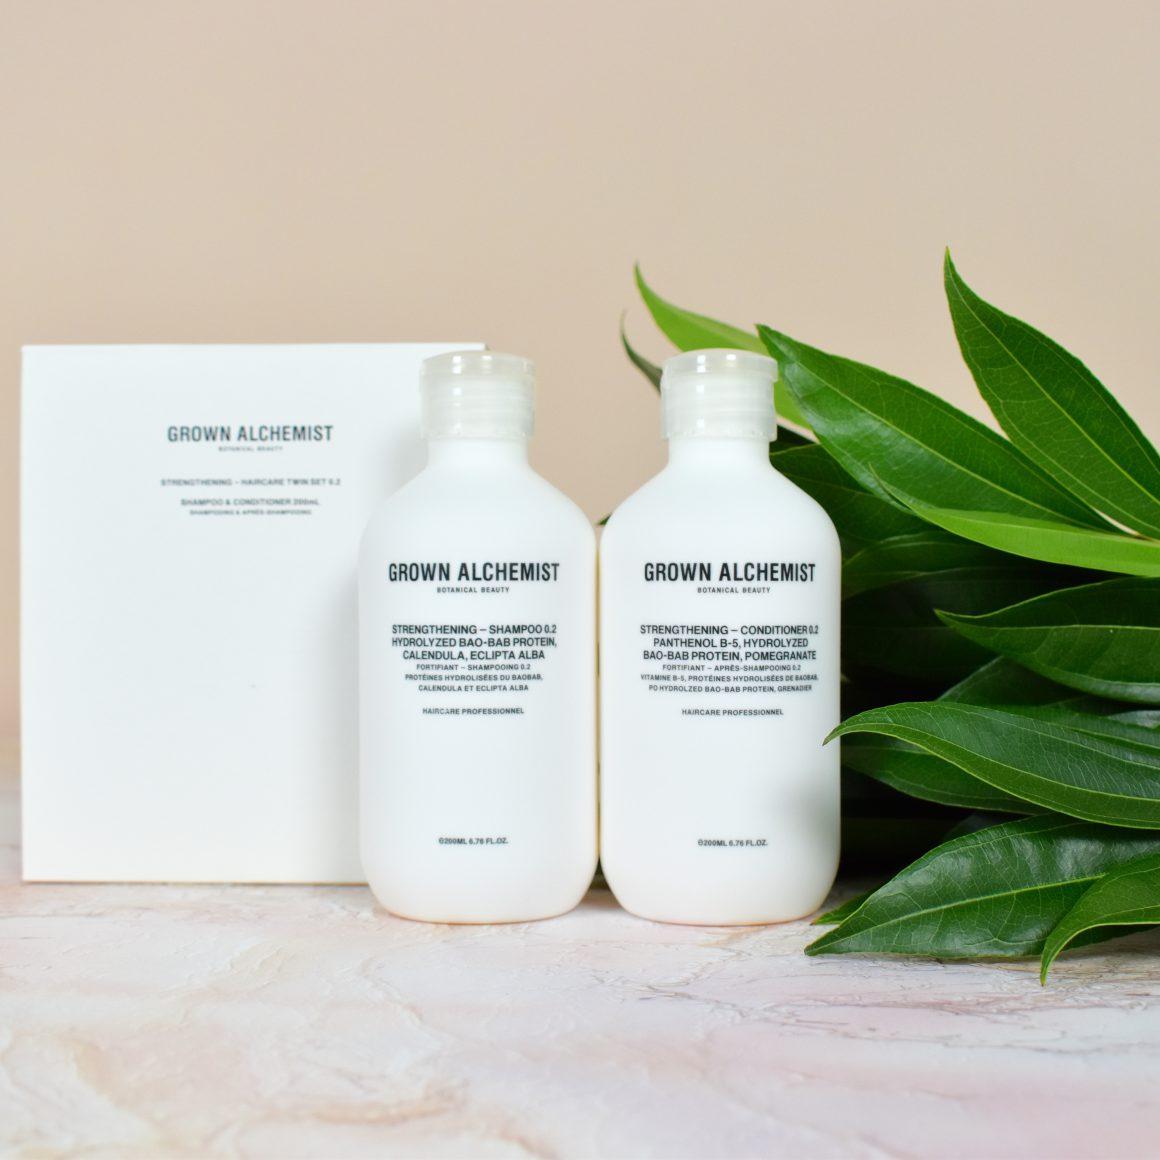 grown-alchemist-strengthening-haircare-twin-set